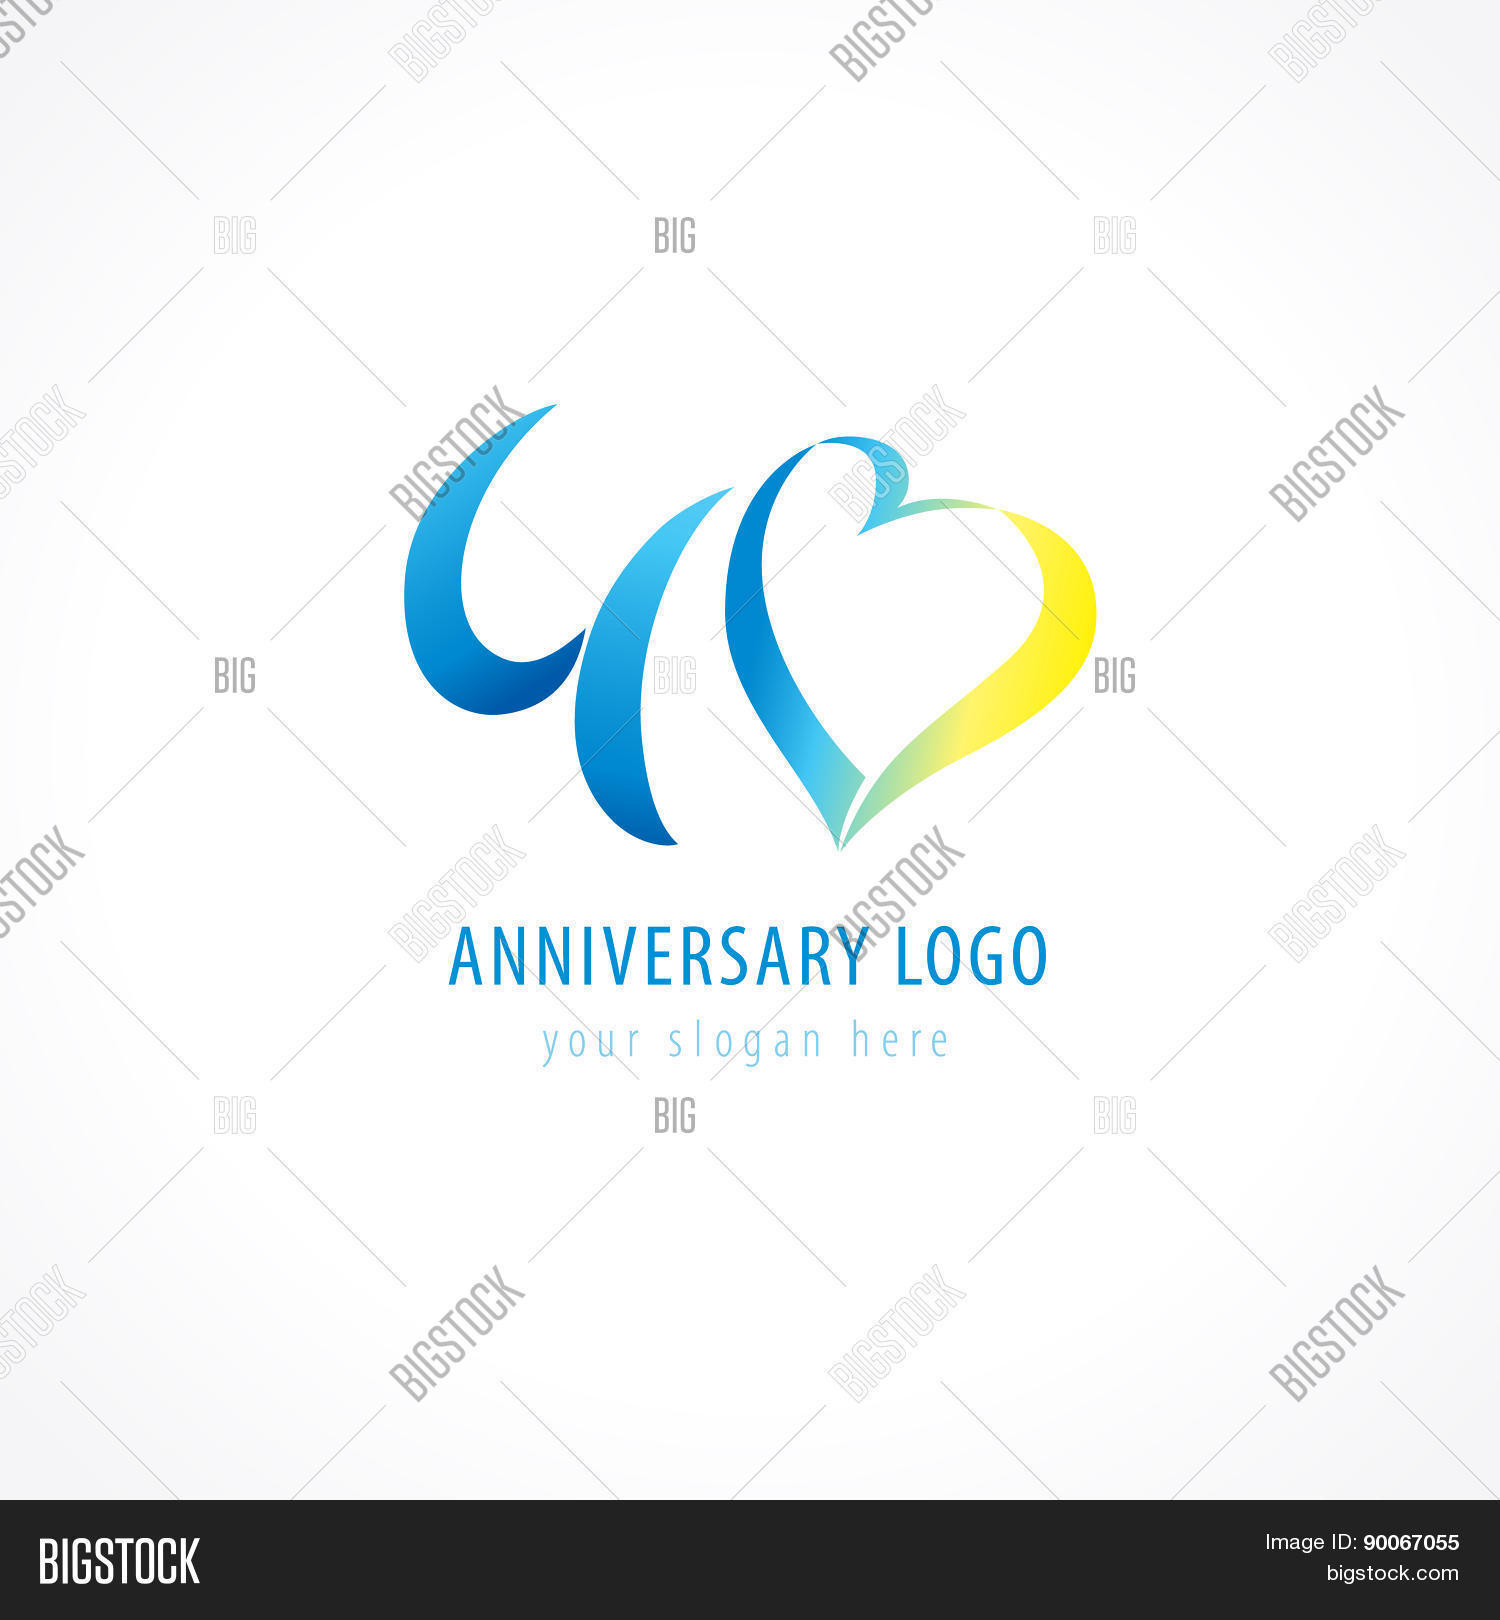 Anniversary 40 Years Vector Photo Free Trial Bigstock